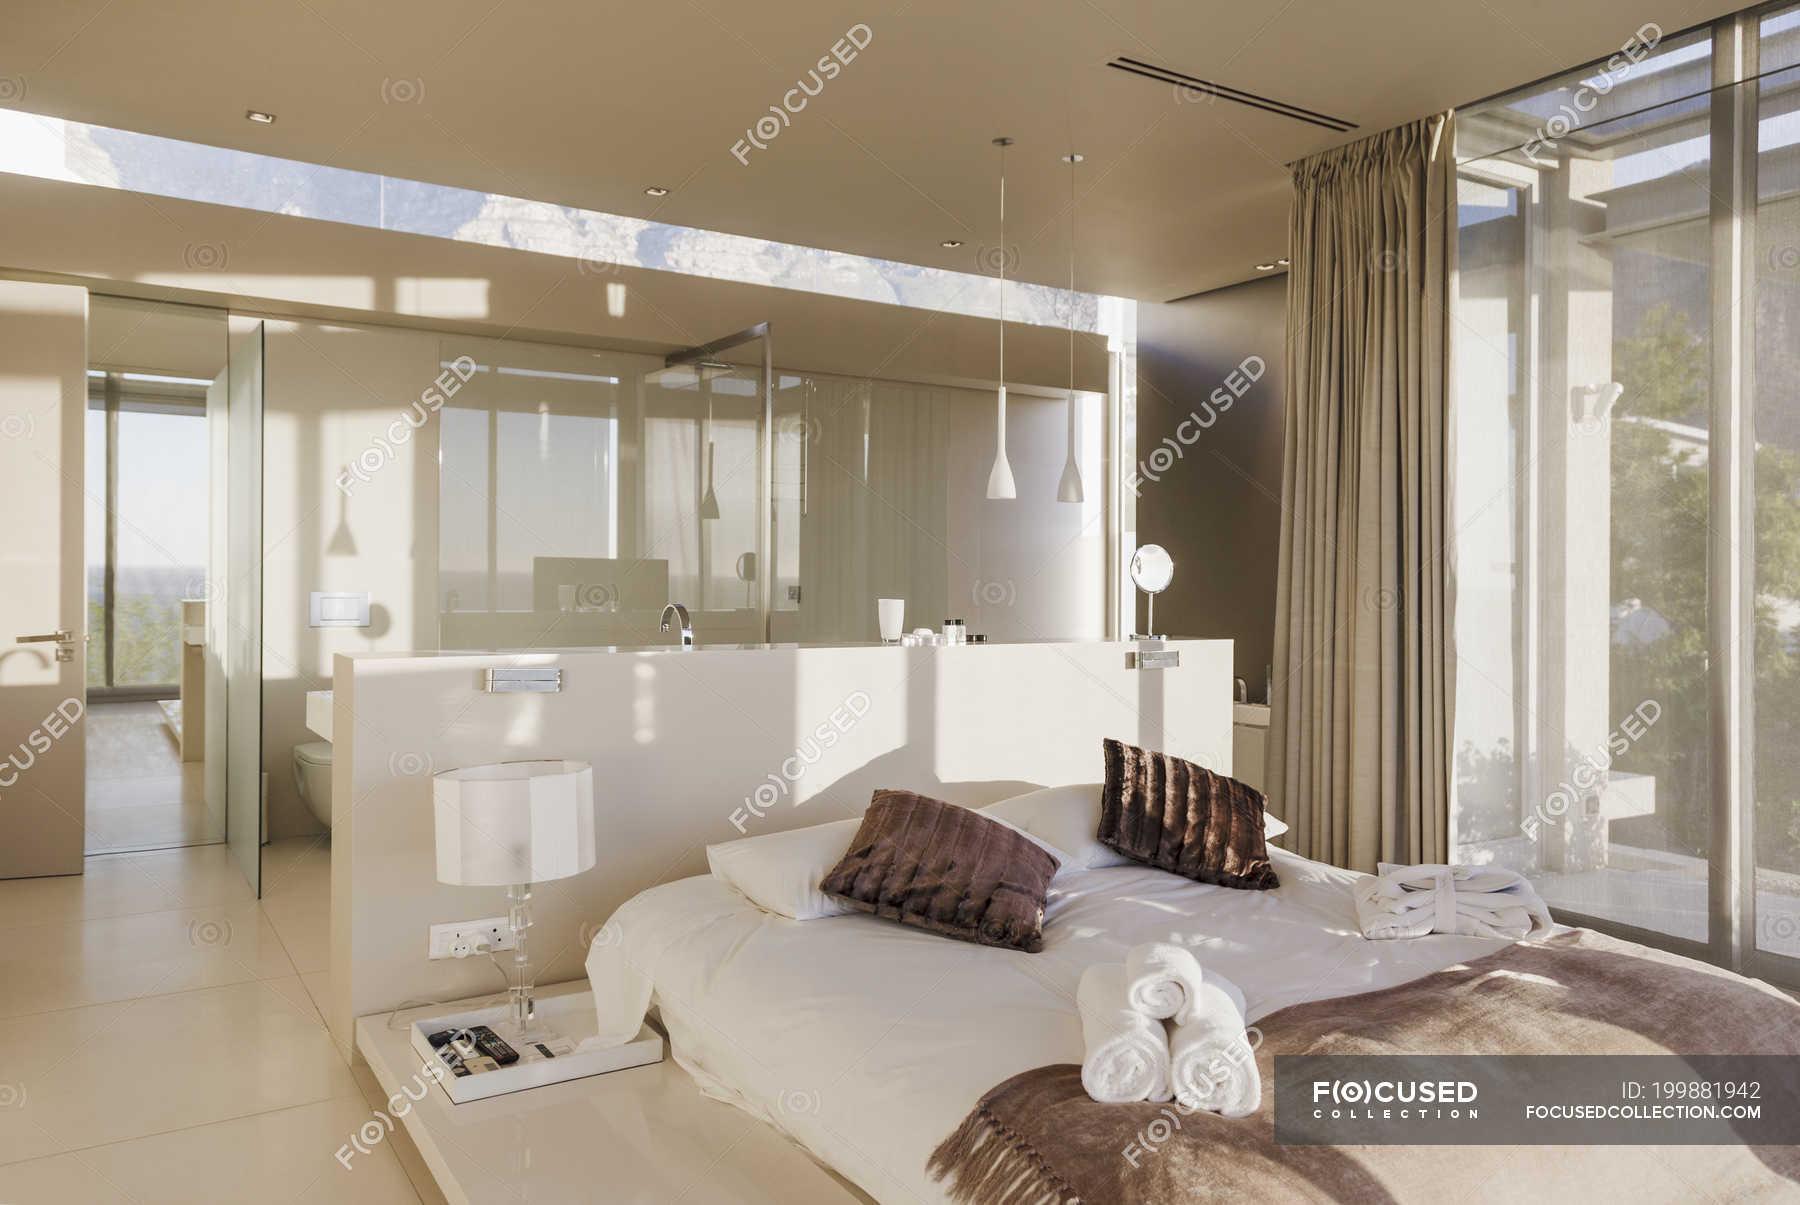 Bed and bathroom in modern master bedroom — real estate, travel